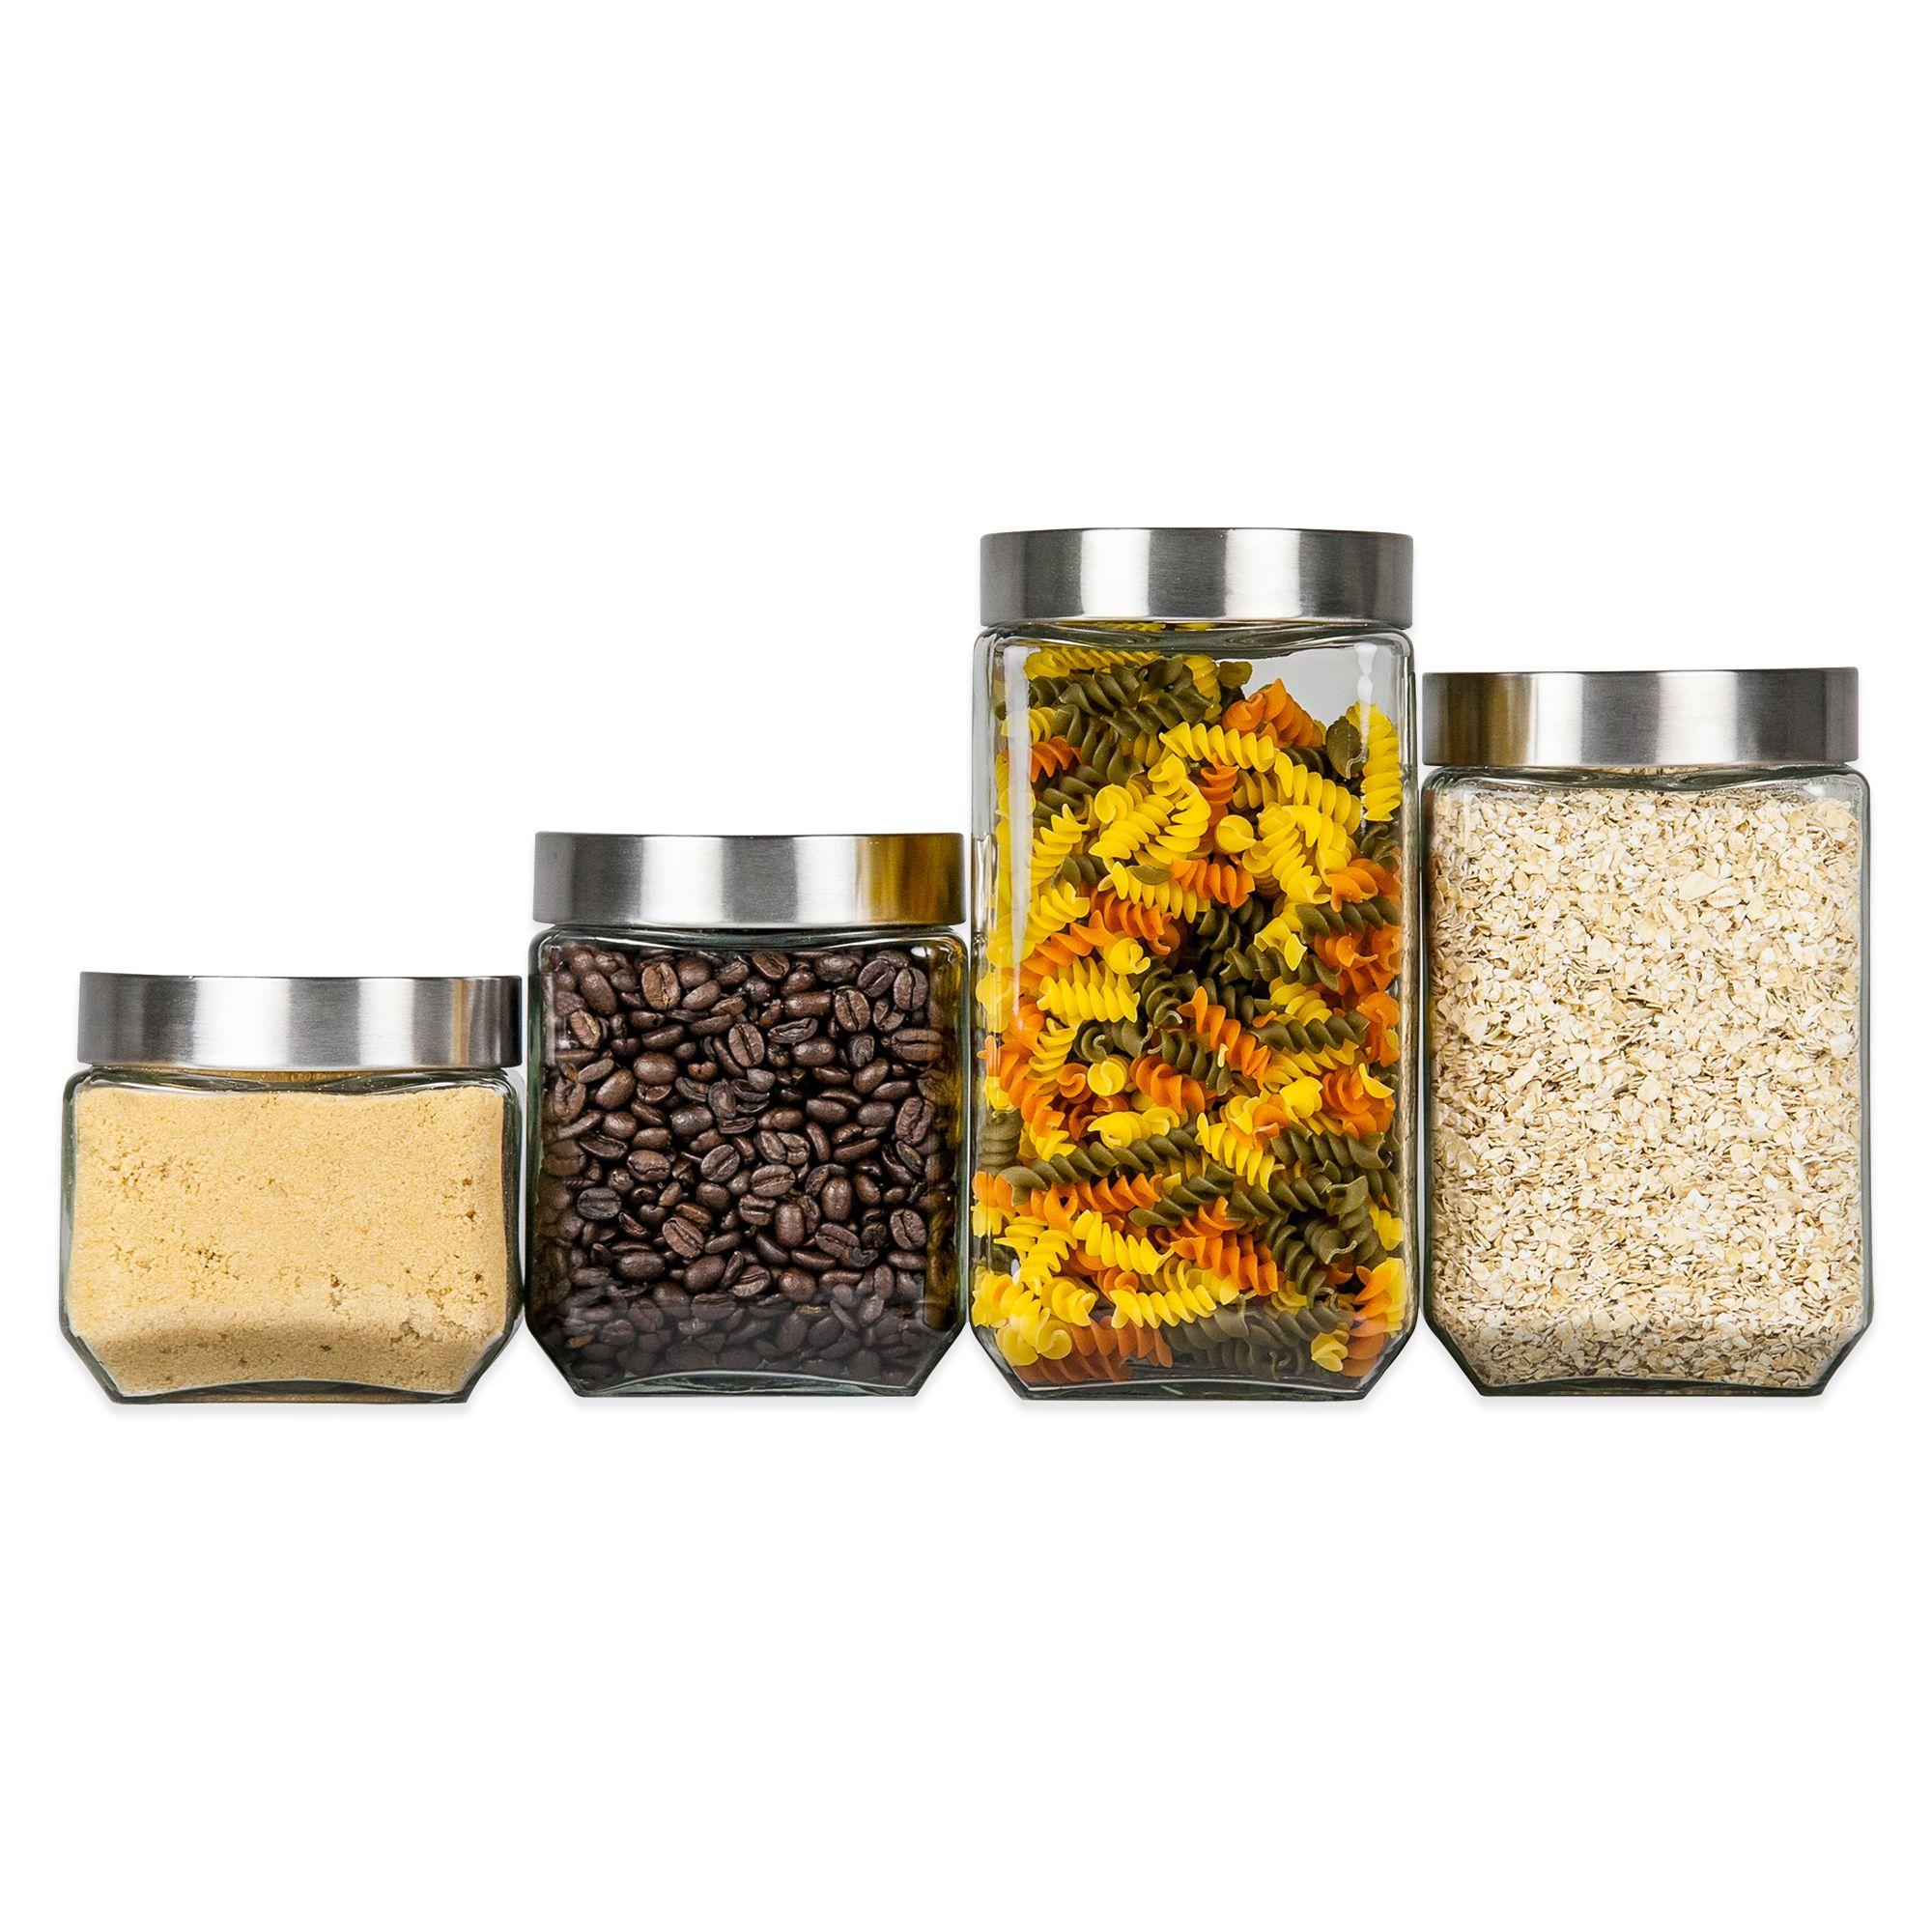 food storage cookie jars canister sets u0026 glass bowls with lids